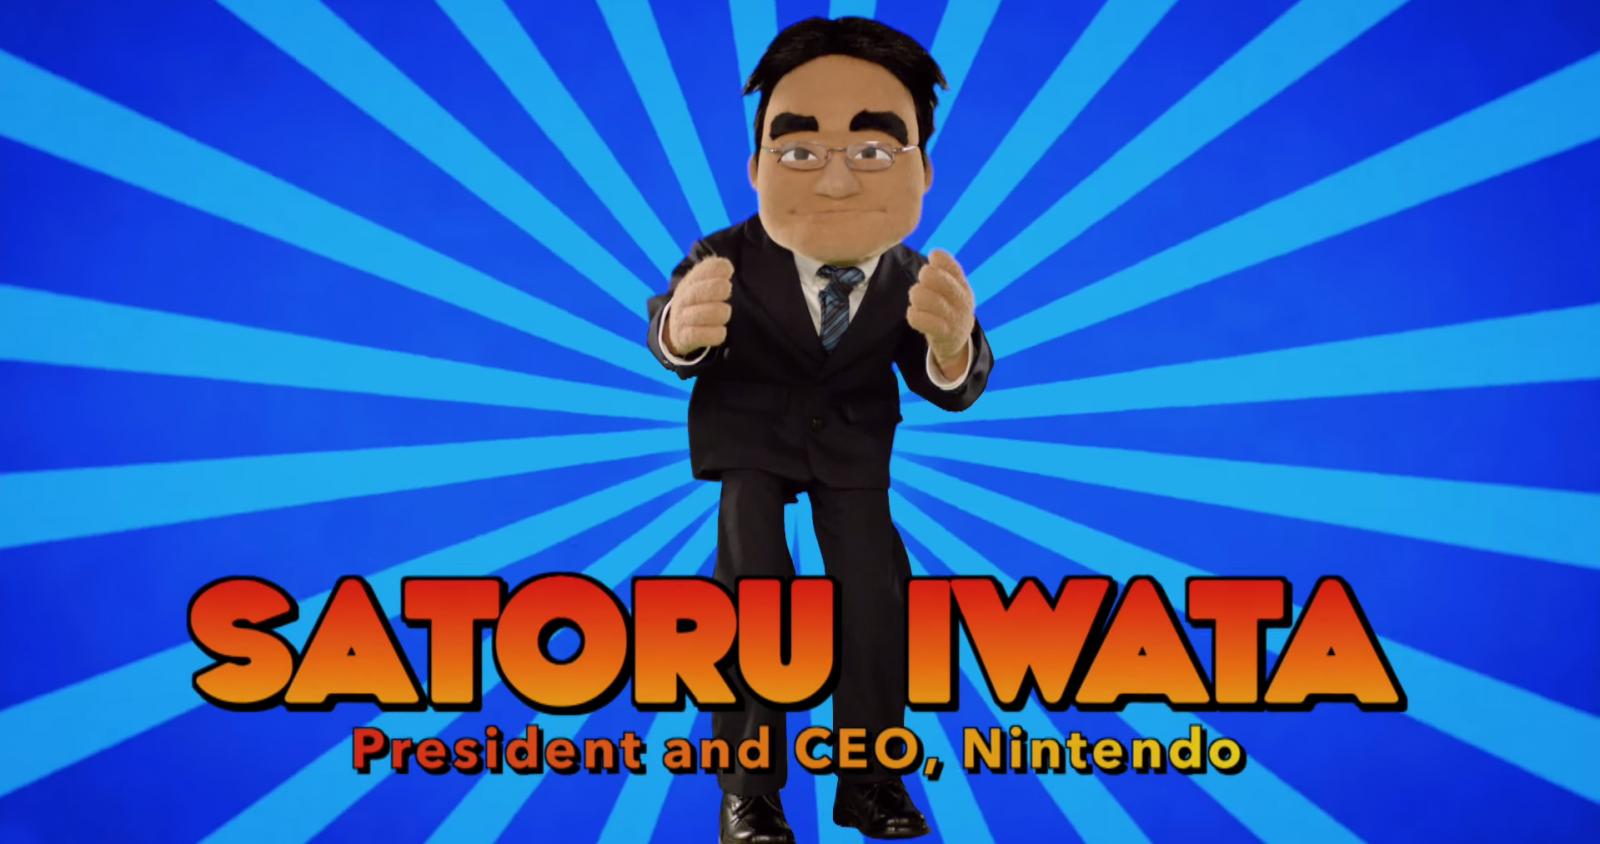 satoru-iwata-nintendo-muppet.png?w=736